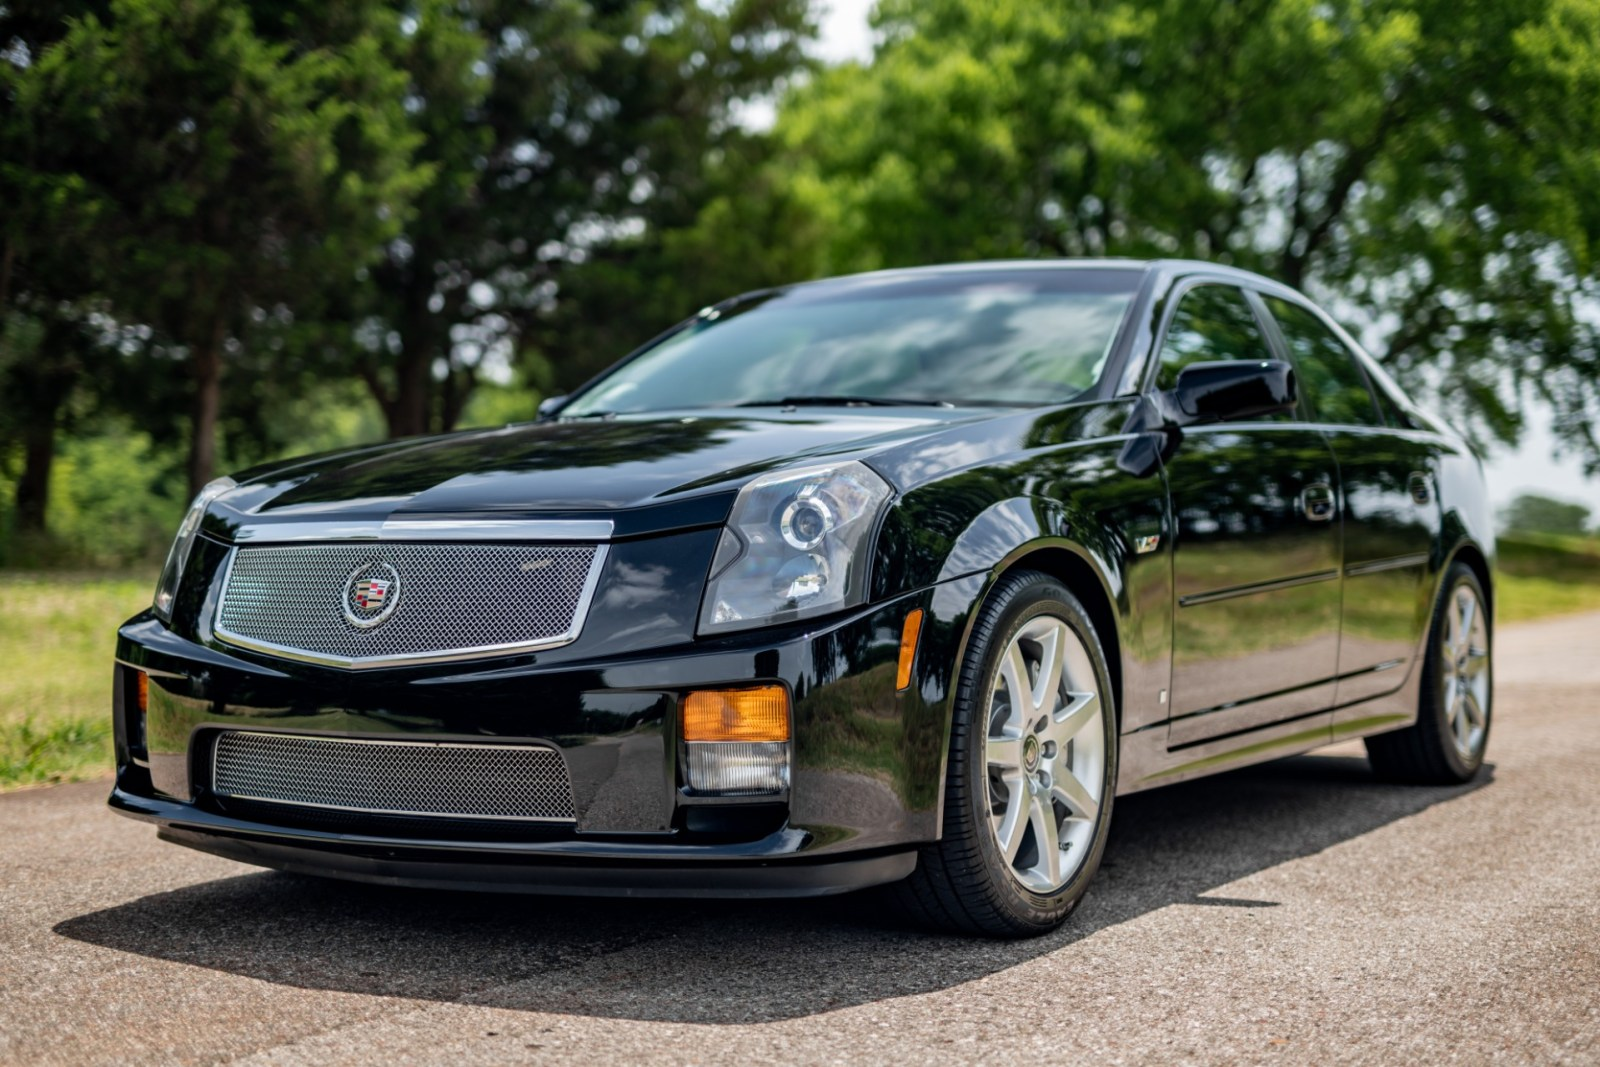 Black Used 2007 Cadillac CTS-V